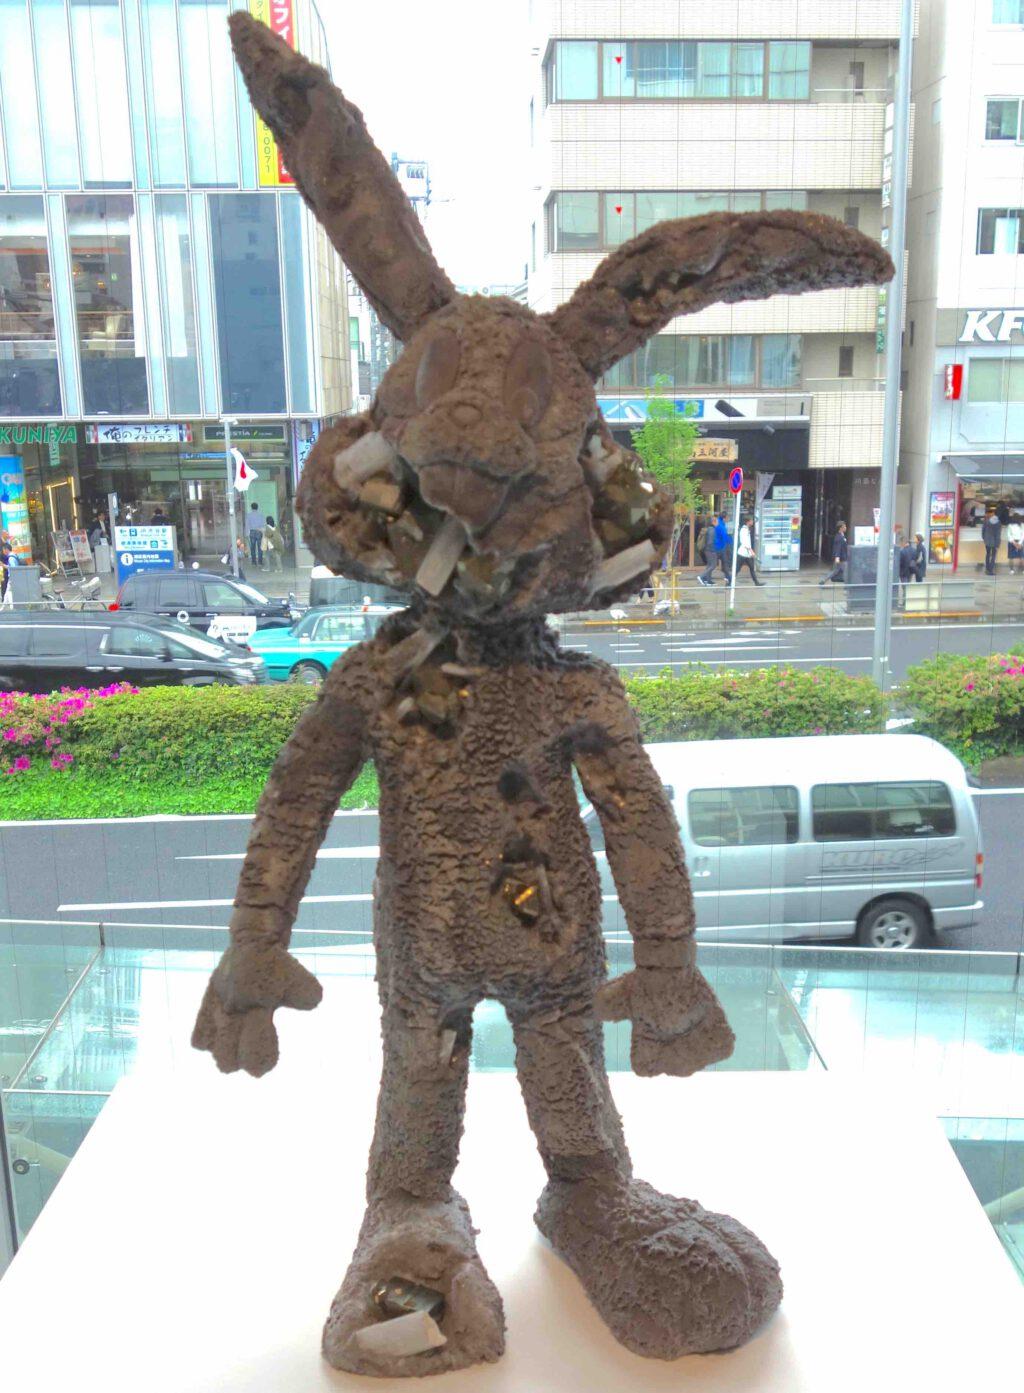 "Daniel Arsham ダニエル・アーシャム ""Pyrite Eroded Rabbit"" 2017, Pyrite, Selenite, hydrostone, 71.1 x 33 x 17.8 cm"